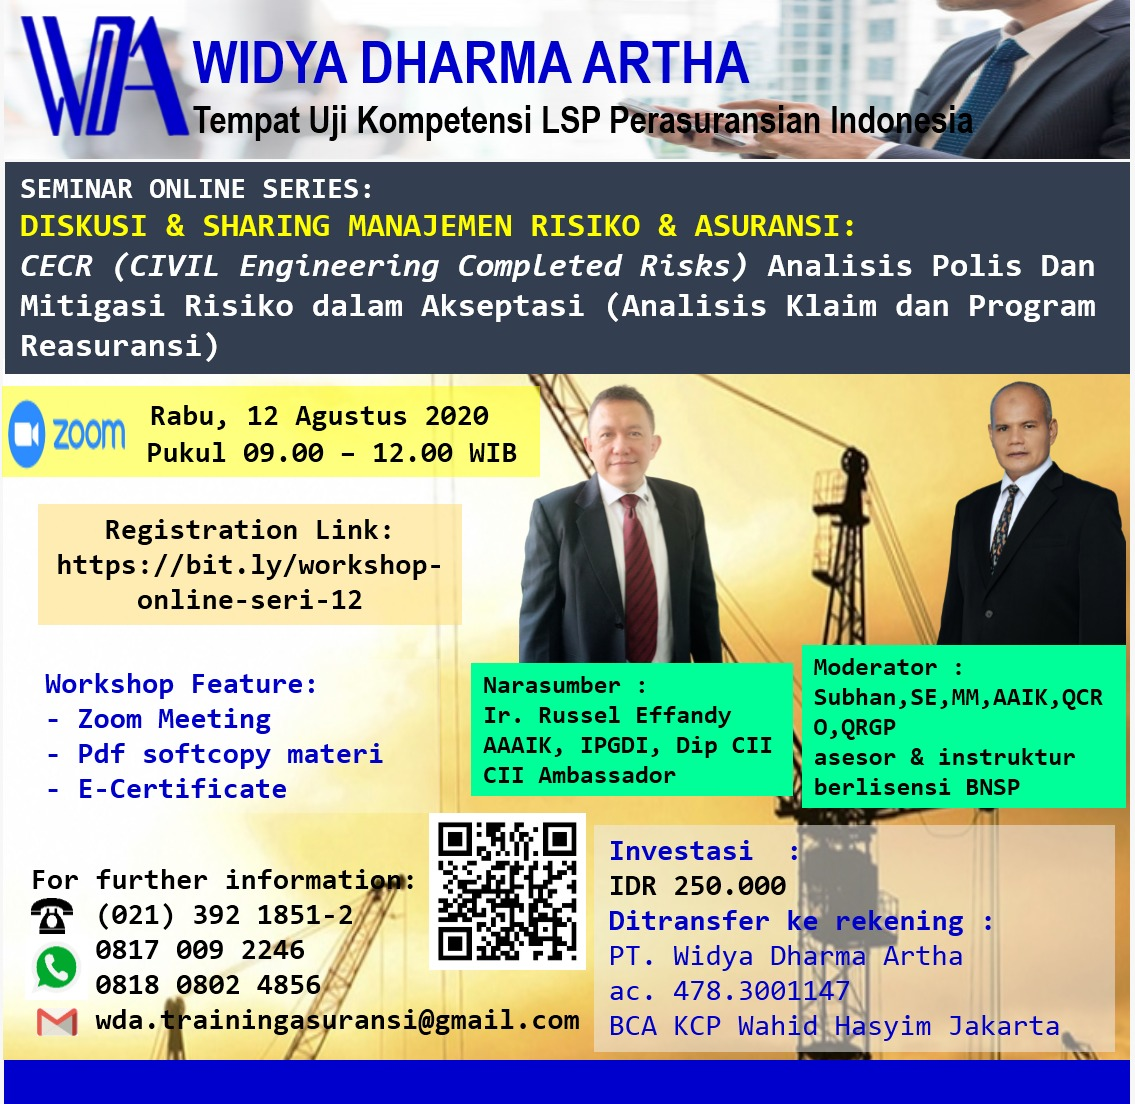 wda-pelatihan-online-polis-cecr-12-agustus-2020-0900-1200